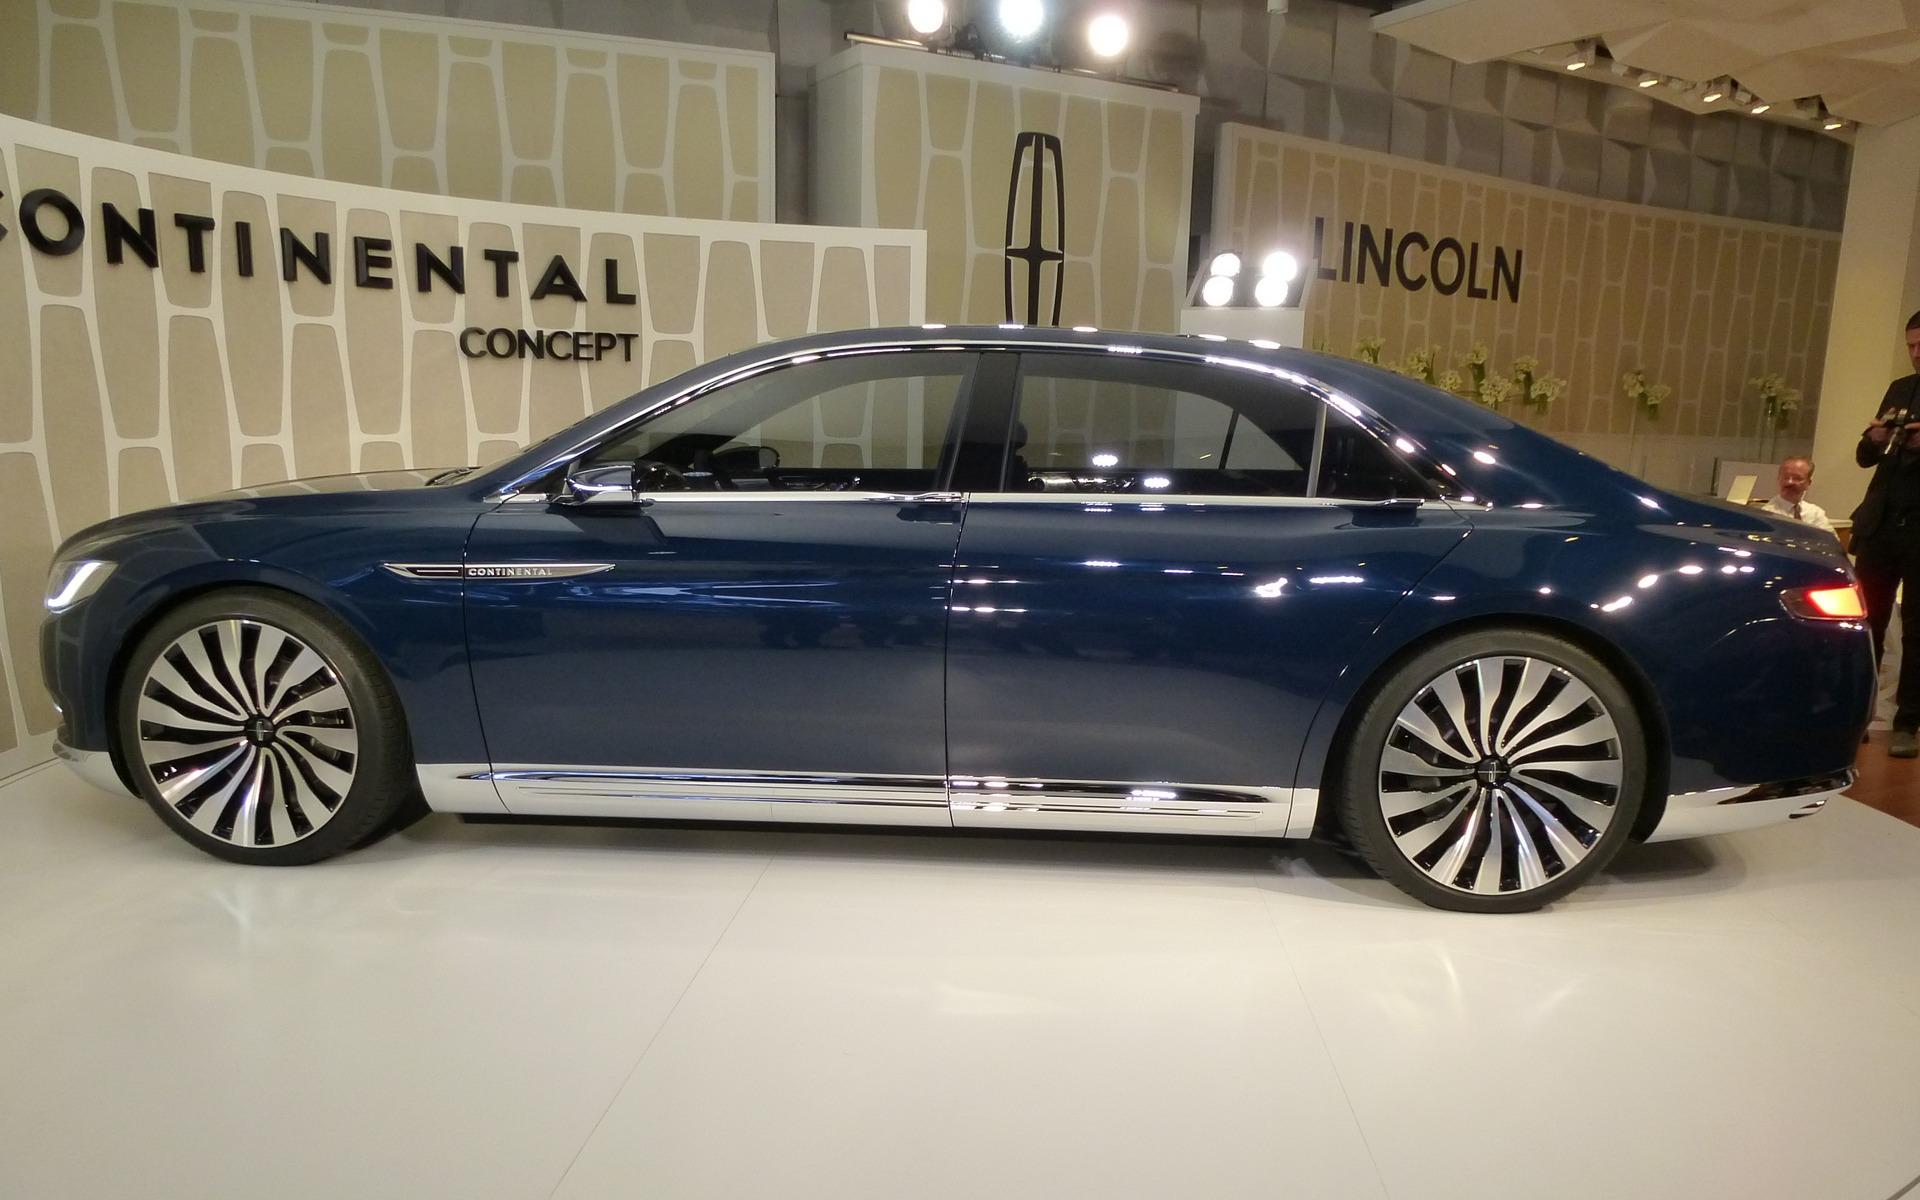 Lincoln Continental Concept 2015, retour vers le futur - 8/13